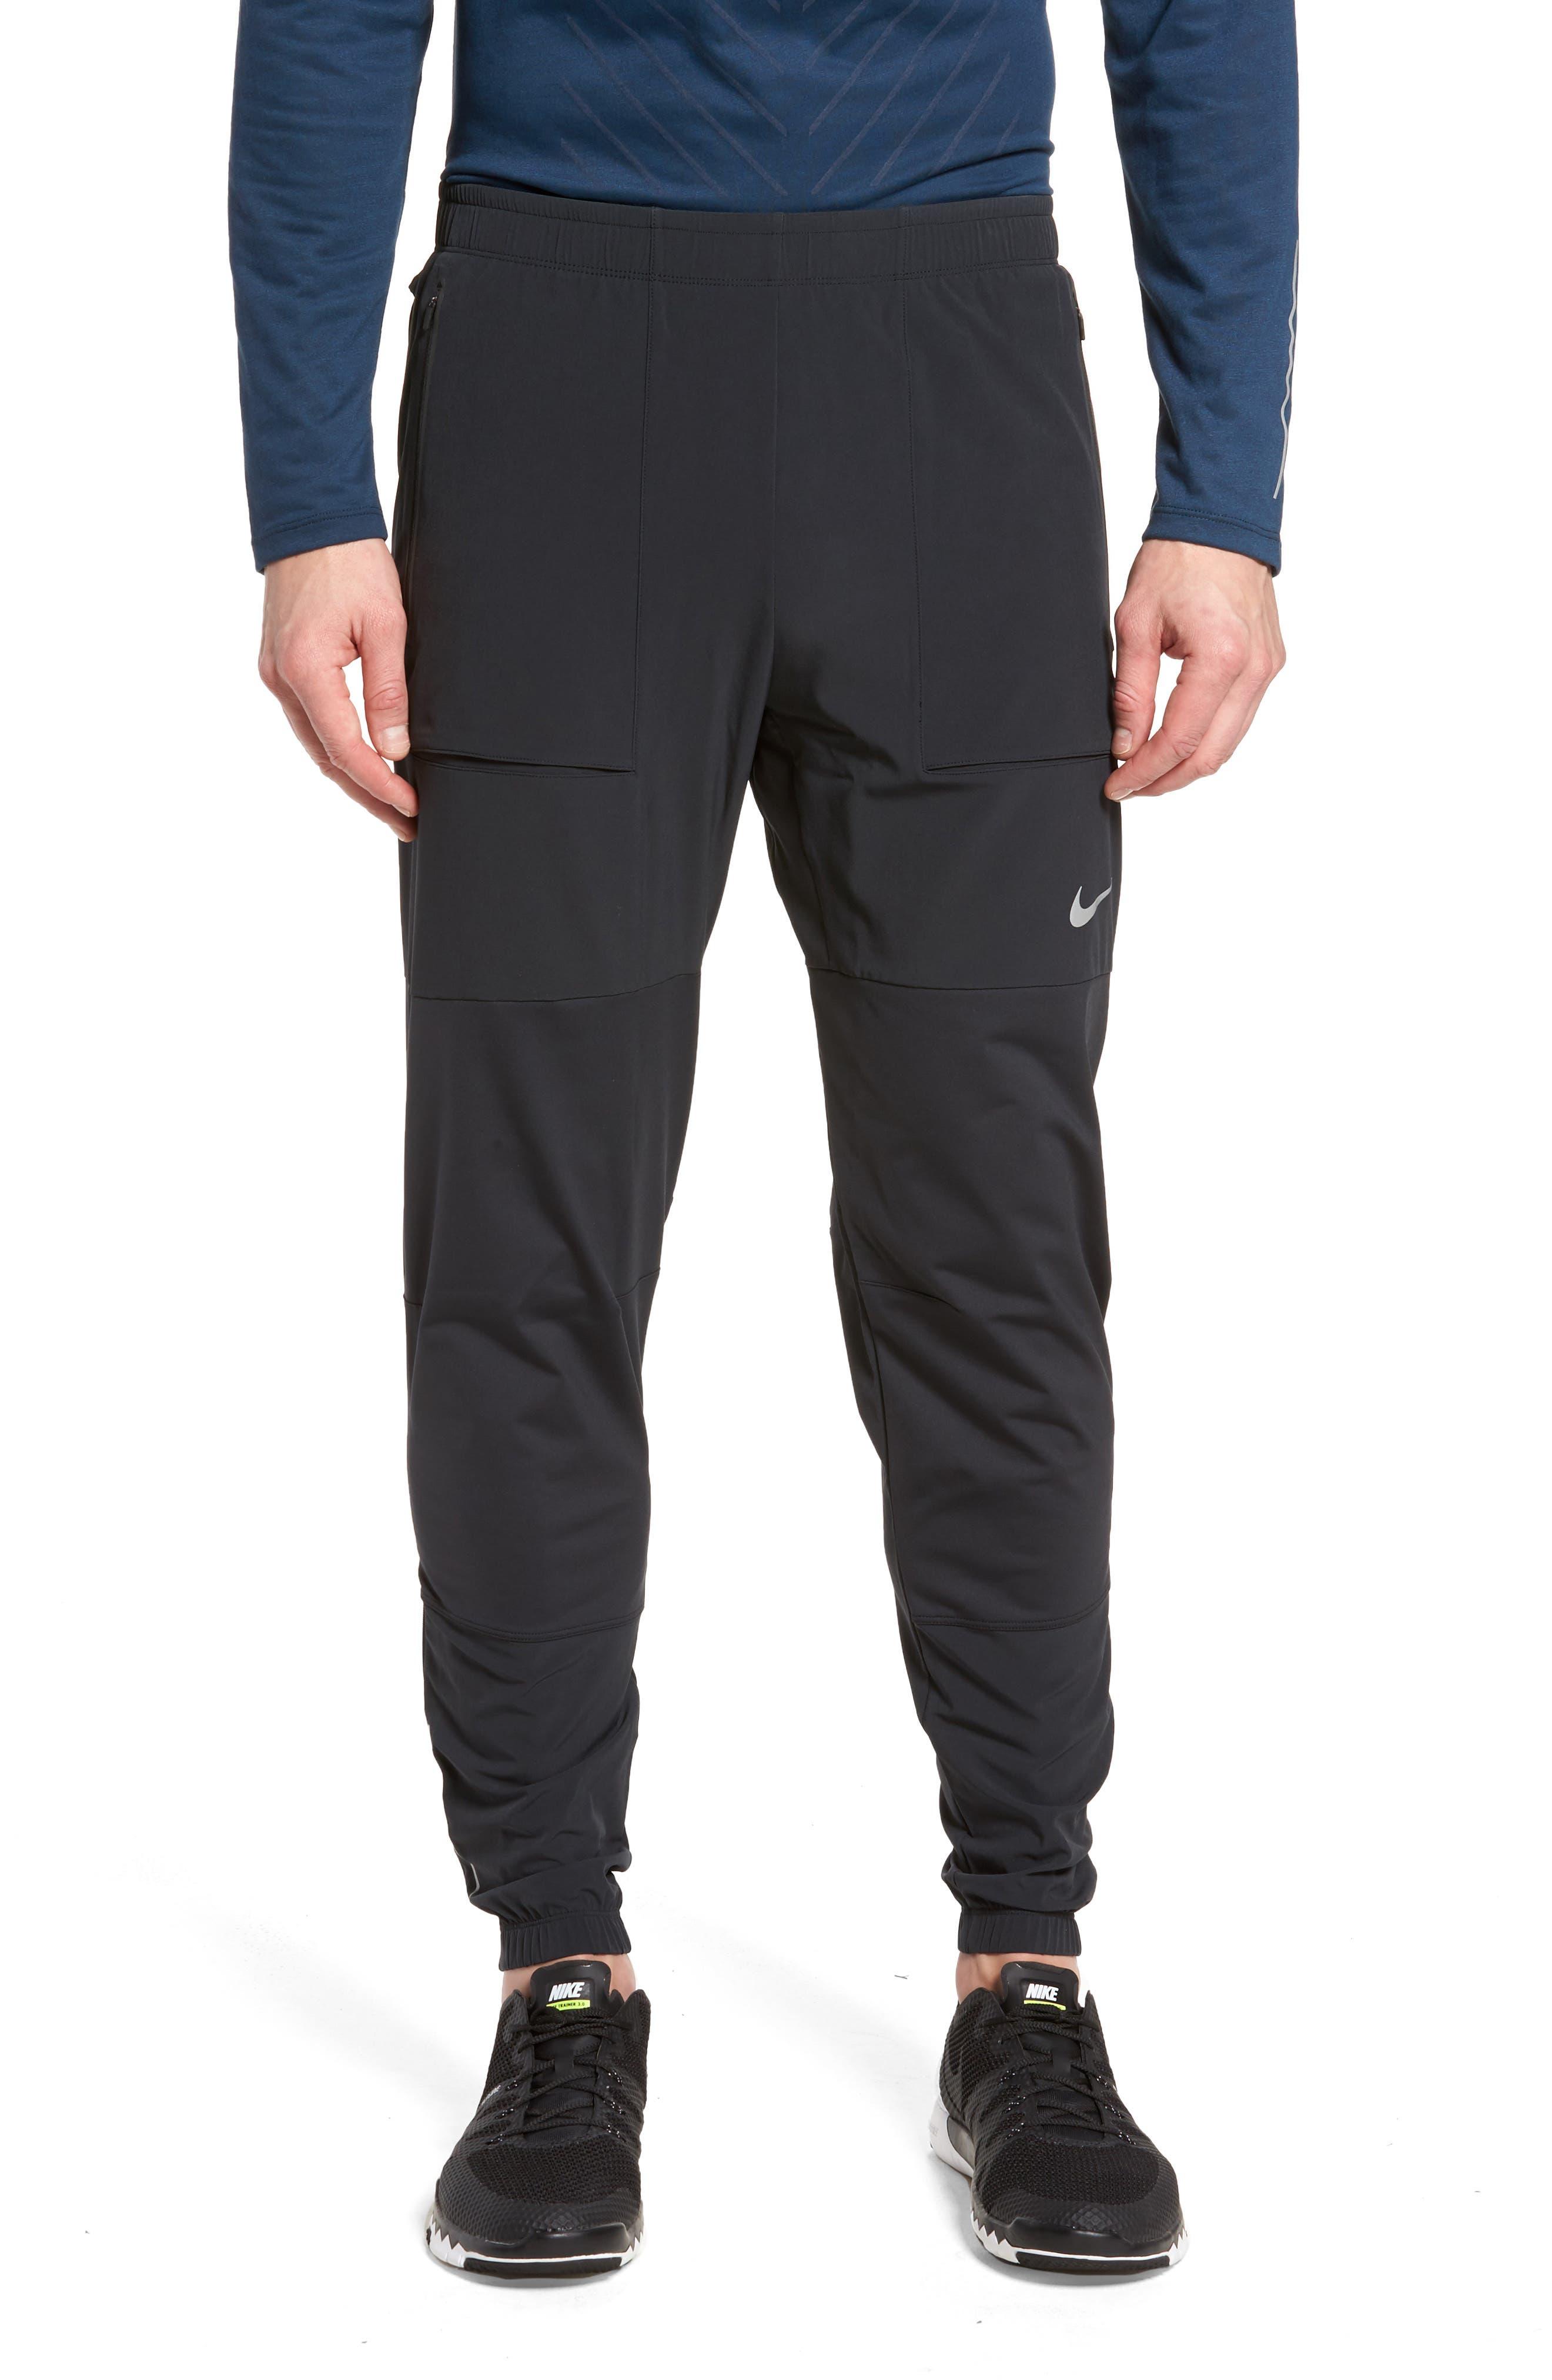 Main Image - Nike Running Pants